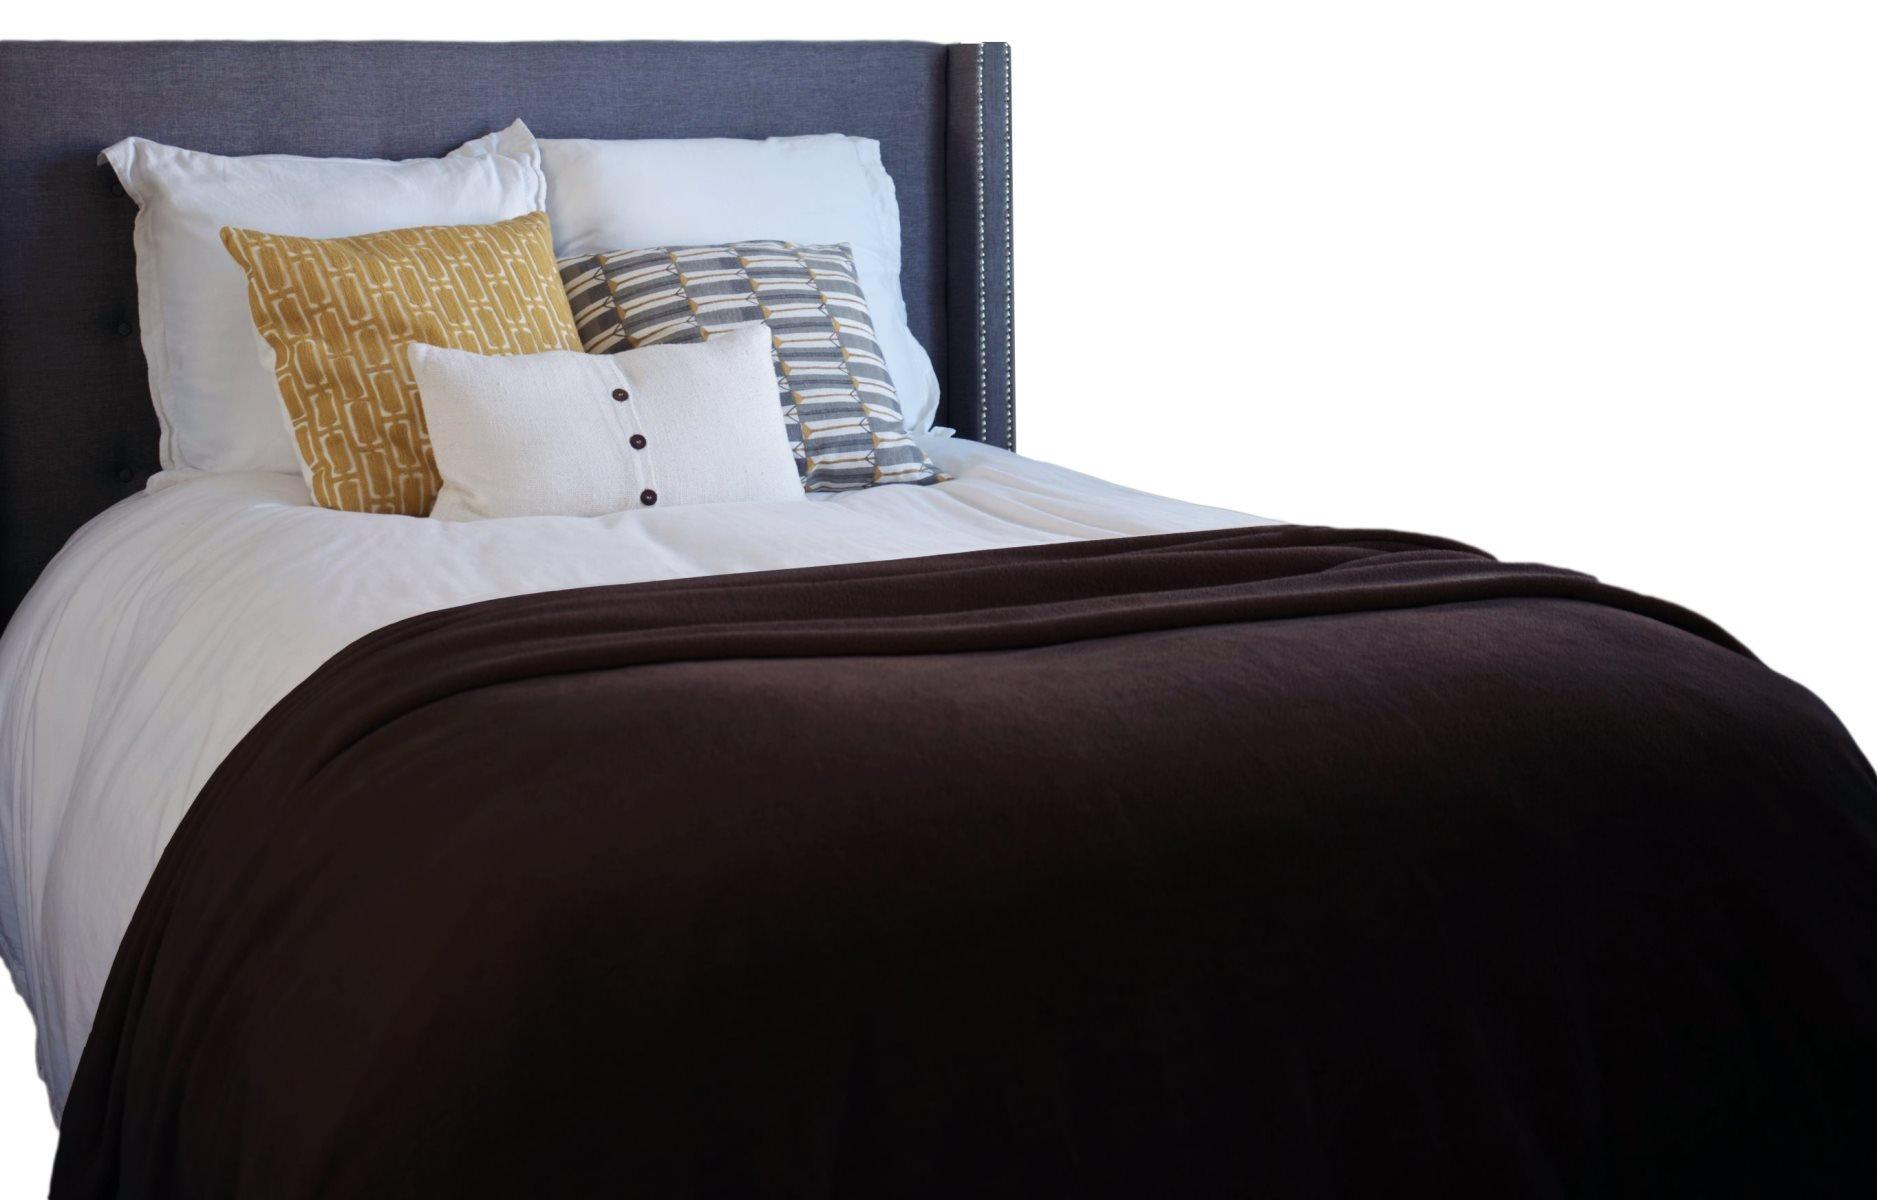 Napa Super Soft Plush Bed Blanket Brown Queen Size All Season Velvet Throw Blankets, Lightweight and Easy Care Couch Blanket Fleece Blanket, 90\